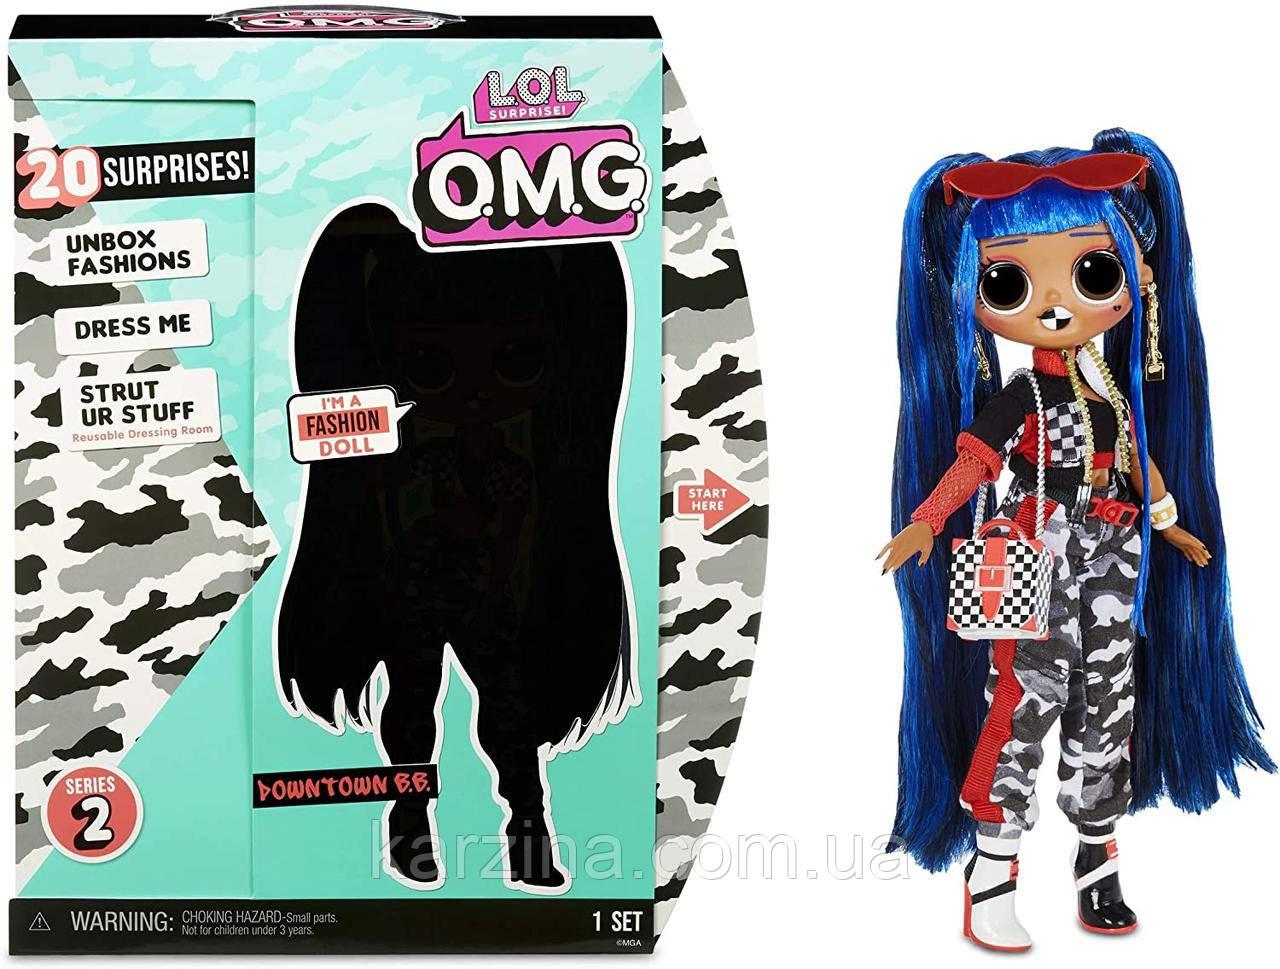 L. O. L. Surprise O. M. G. Даунтаун Бібі Оригінал MGA Downtown B. B. Fashion Doll